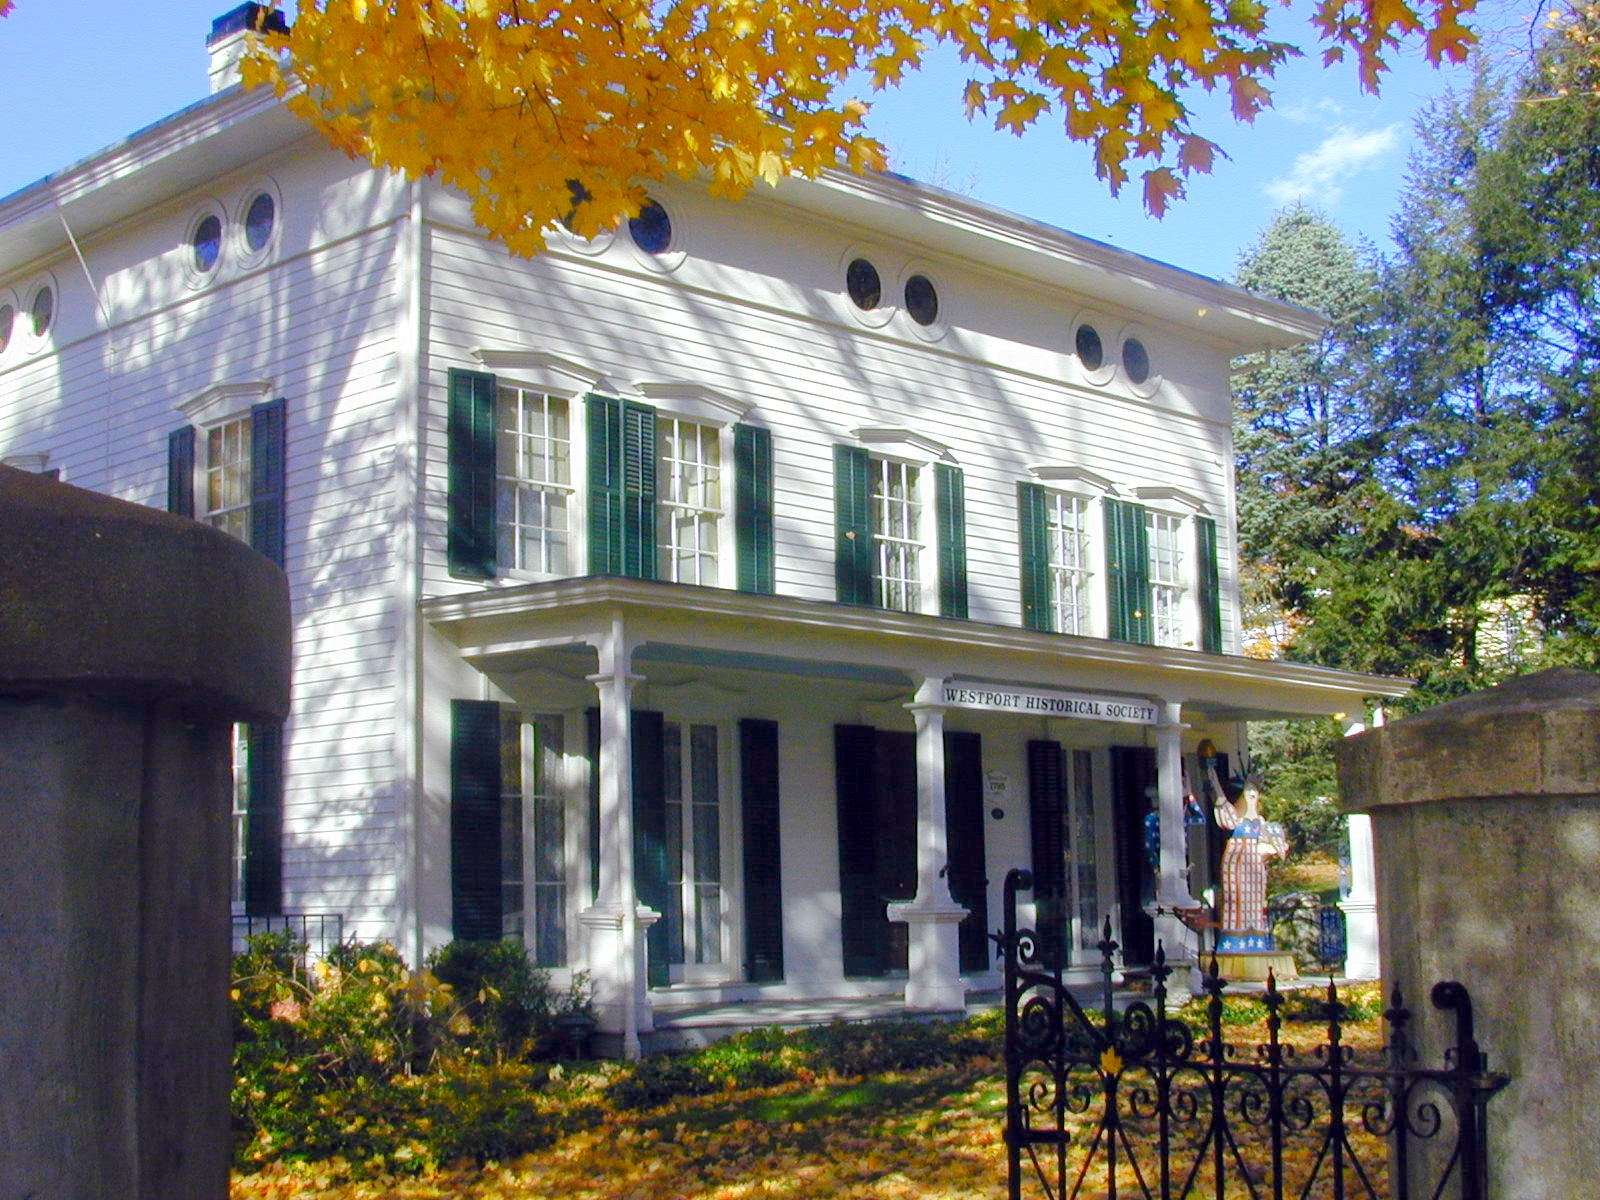 WHS-Seeking Designation of Historic Landmark Property